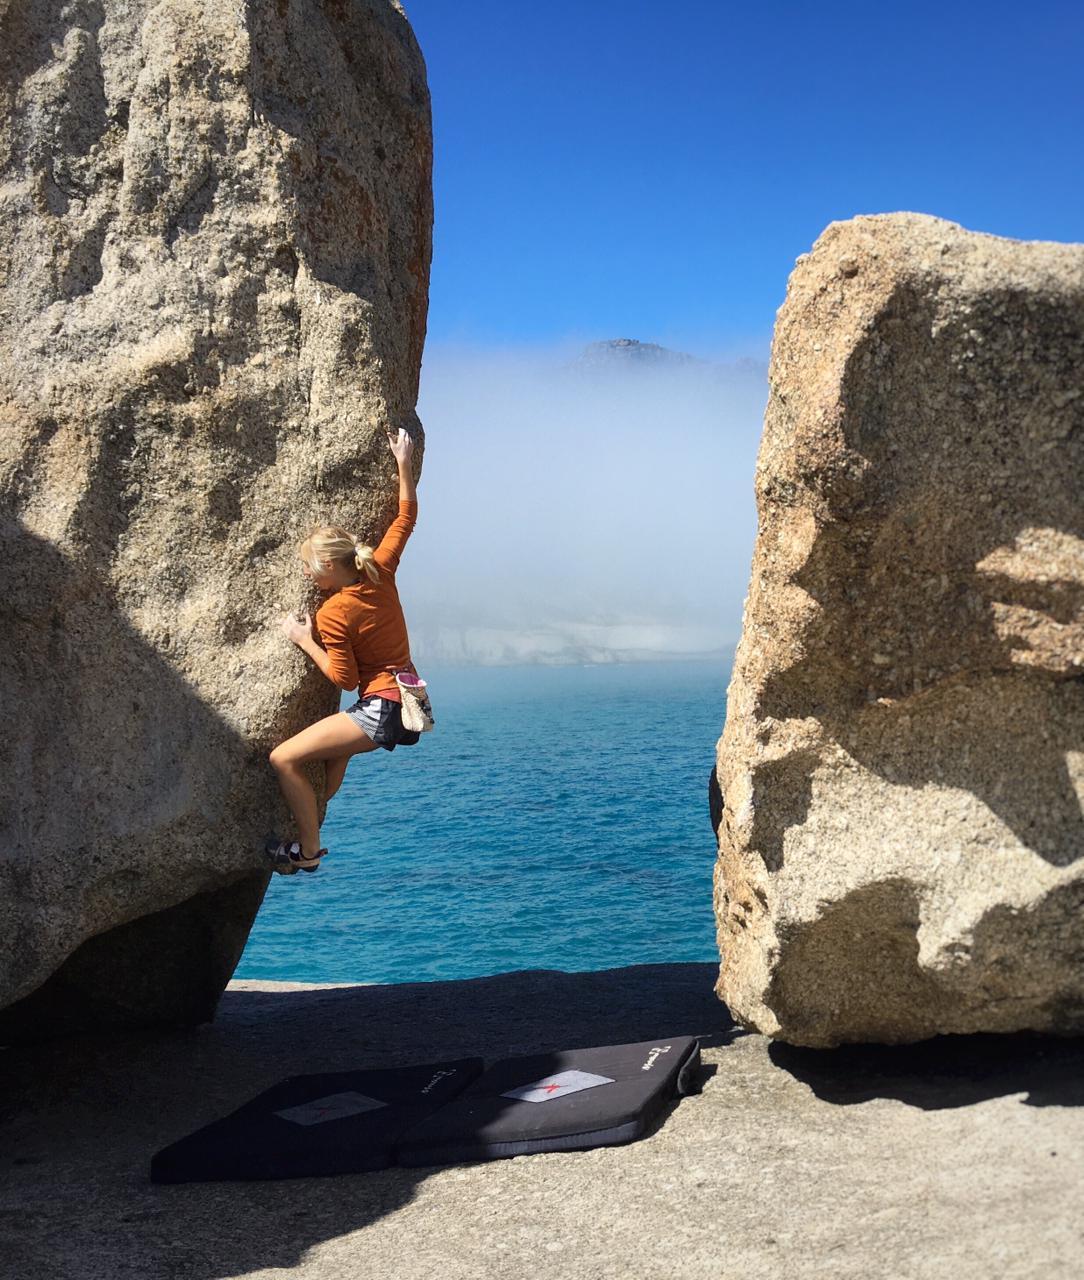 ram mountaineering athlete rouen